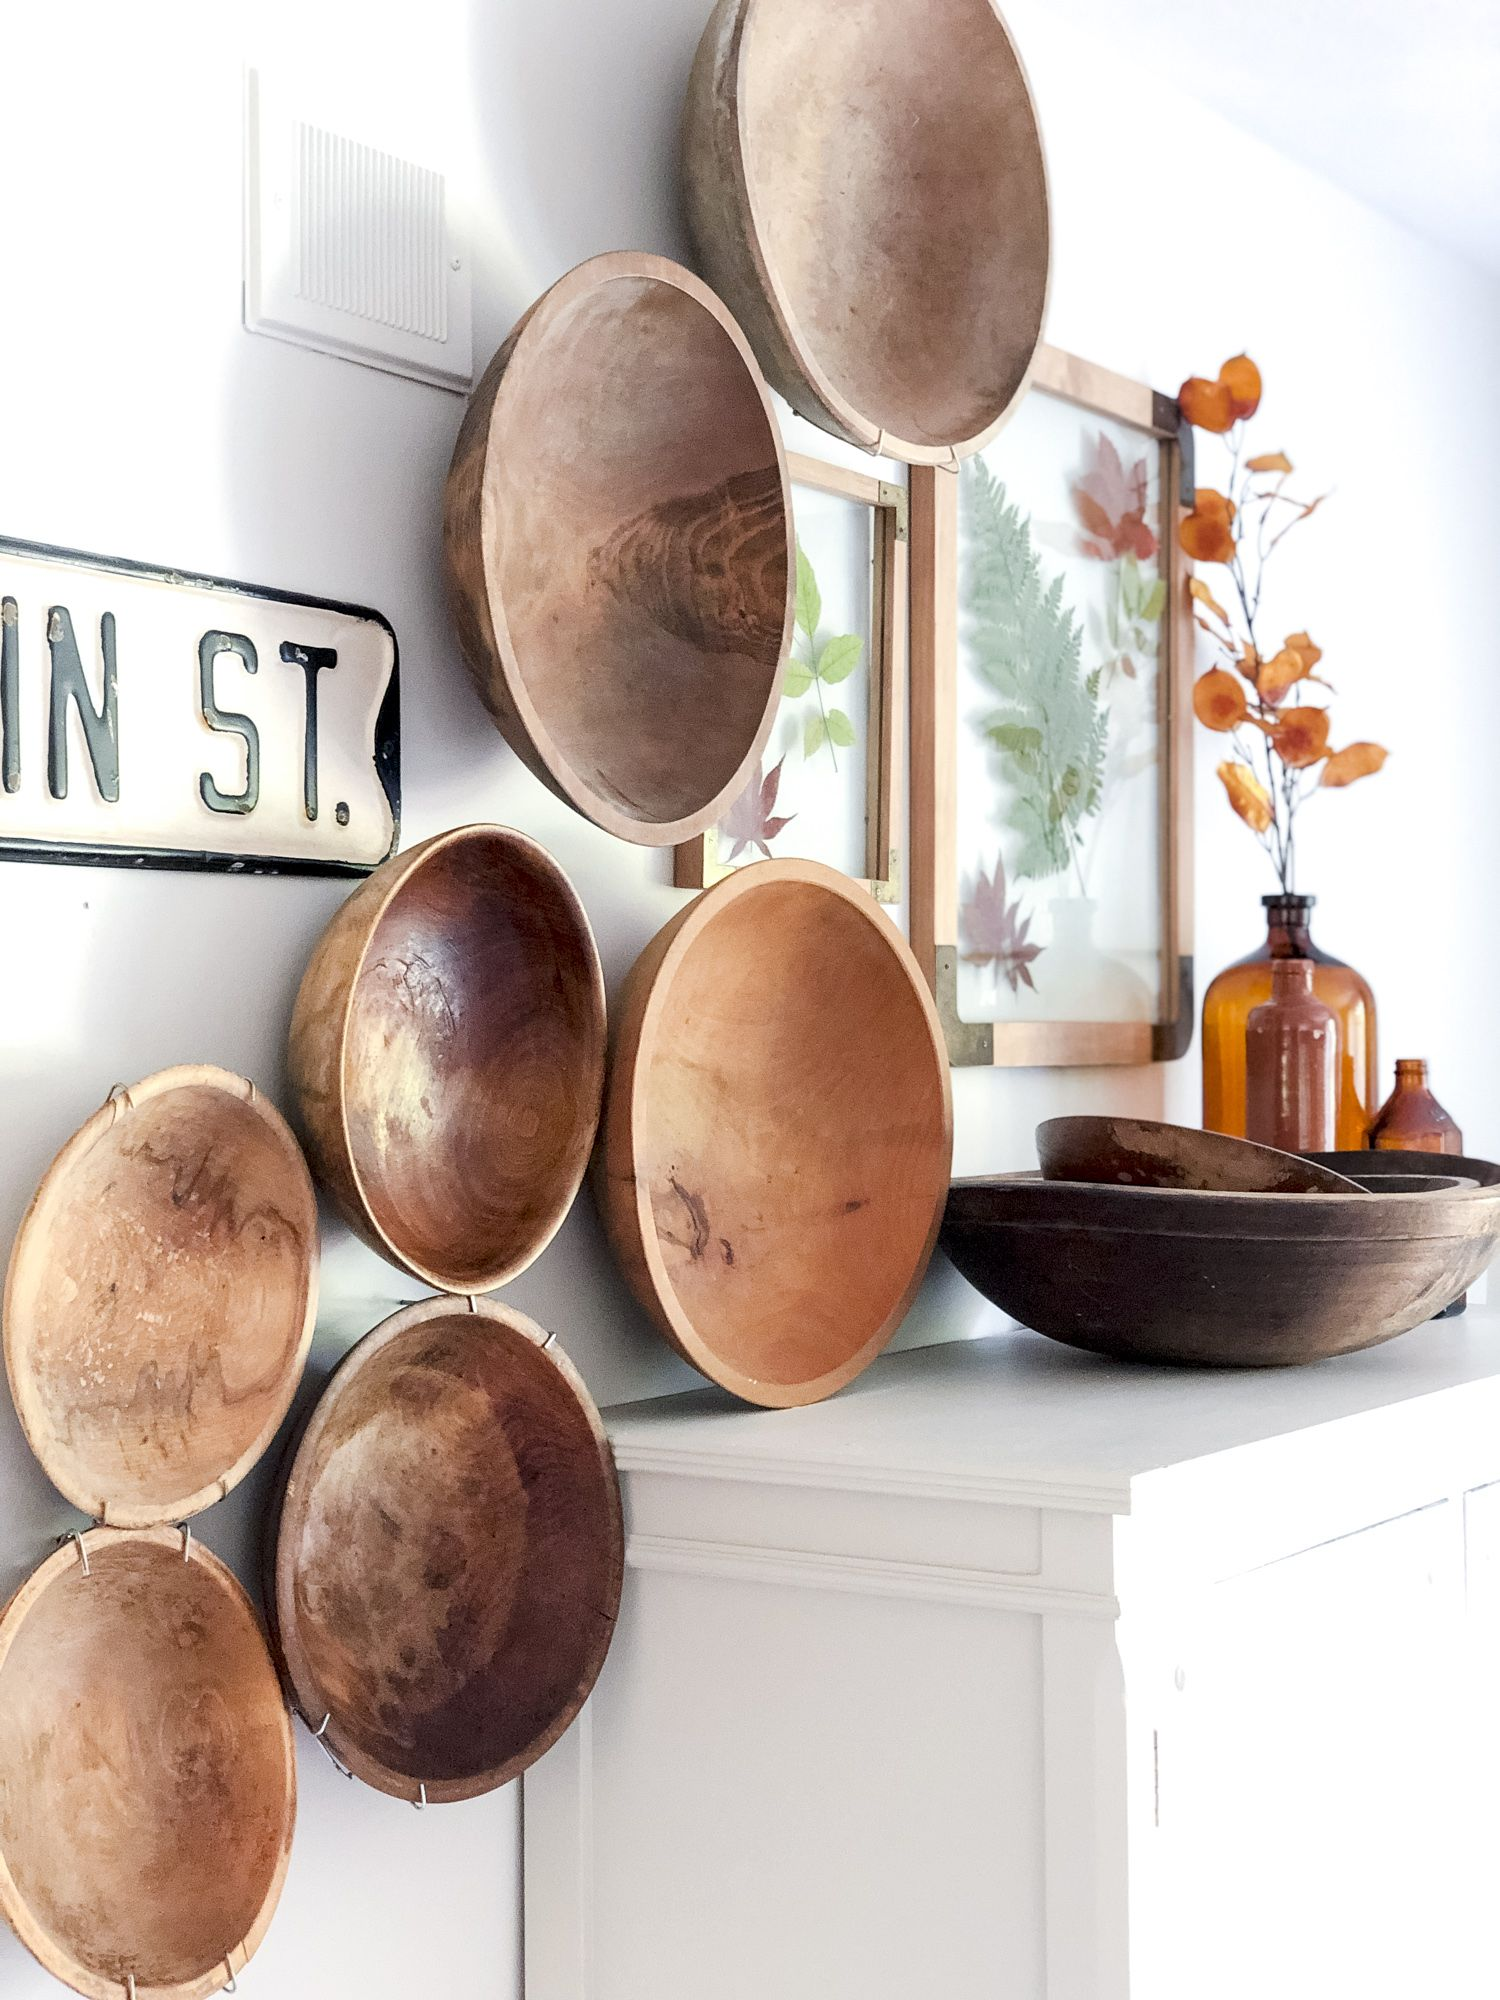 Displaying Vintage Wooden Bowls as Art #woodenwalldecor